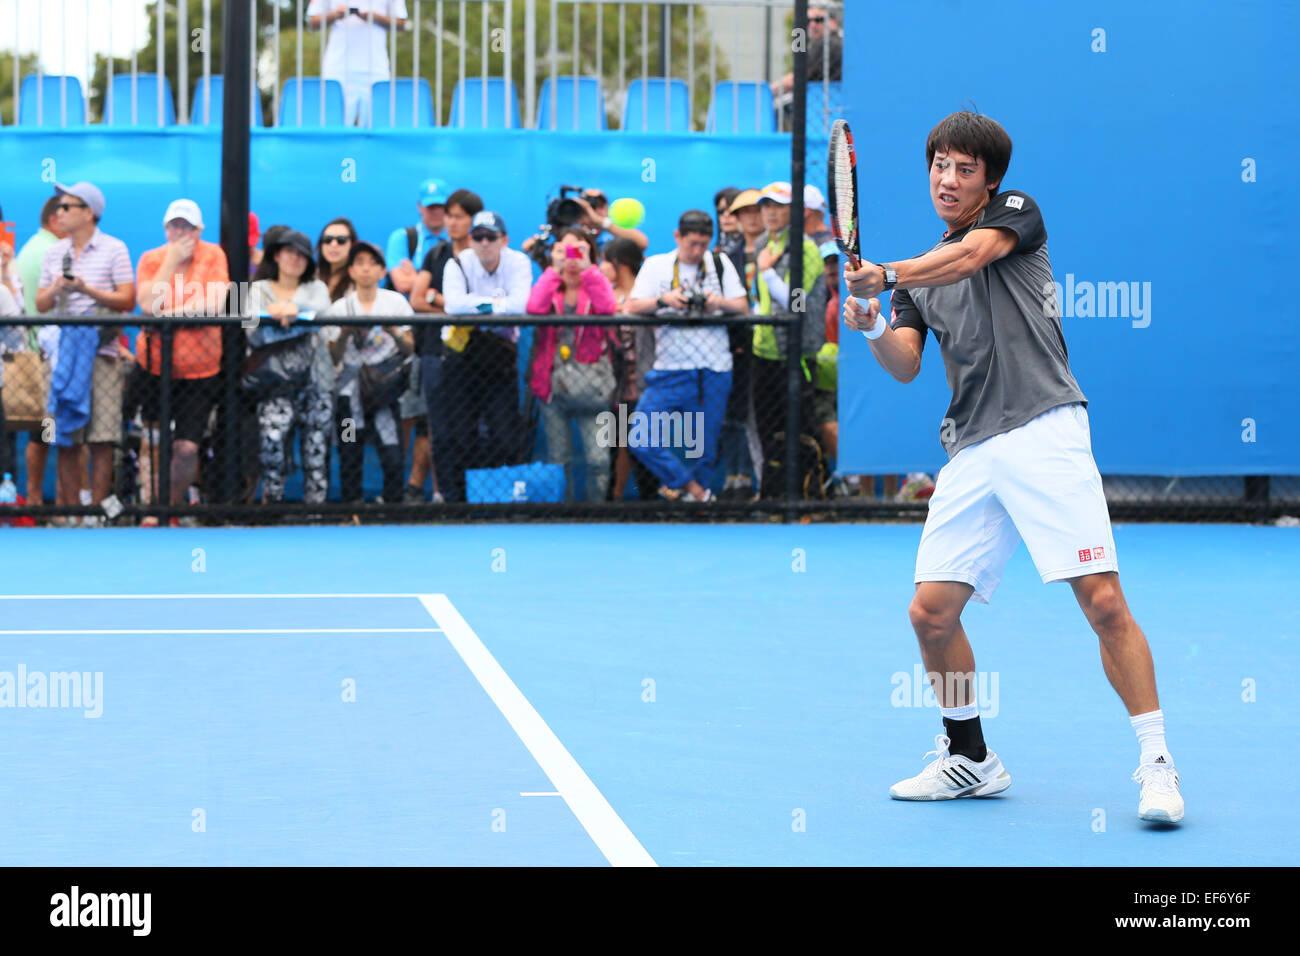 Melbourne, Australien. 28. Januar 2015. Kei Nishikori (JPN) Tennis: Australian Open Tennisturnier 2015 Training Stockfoto